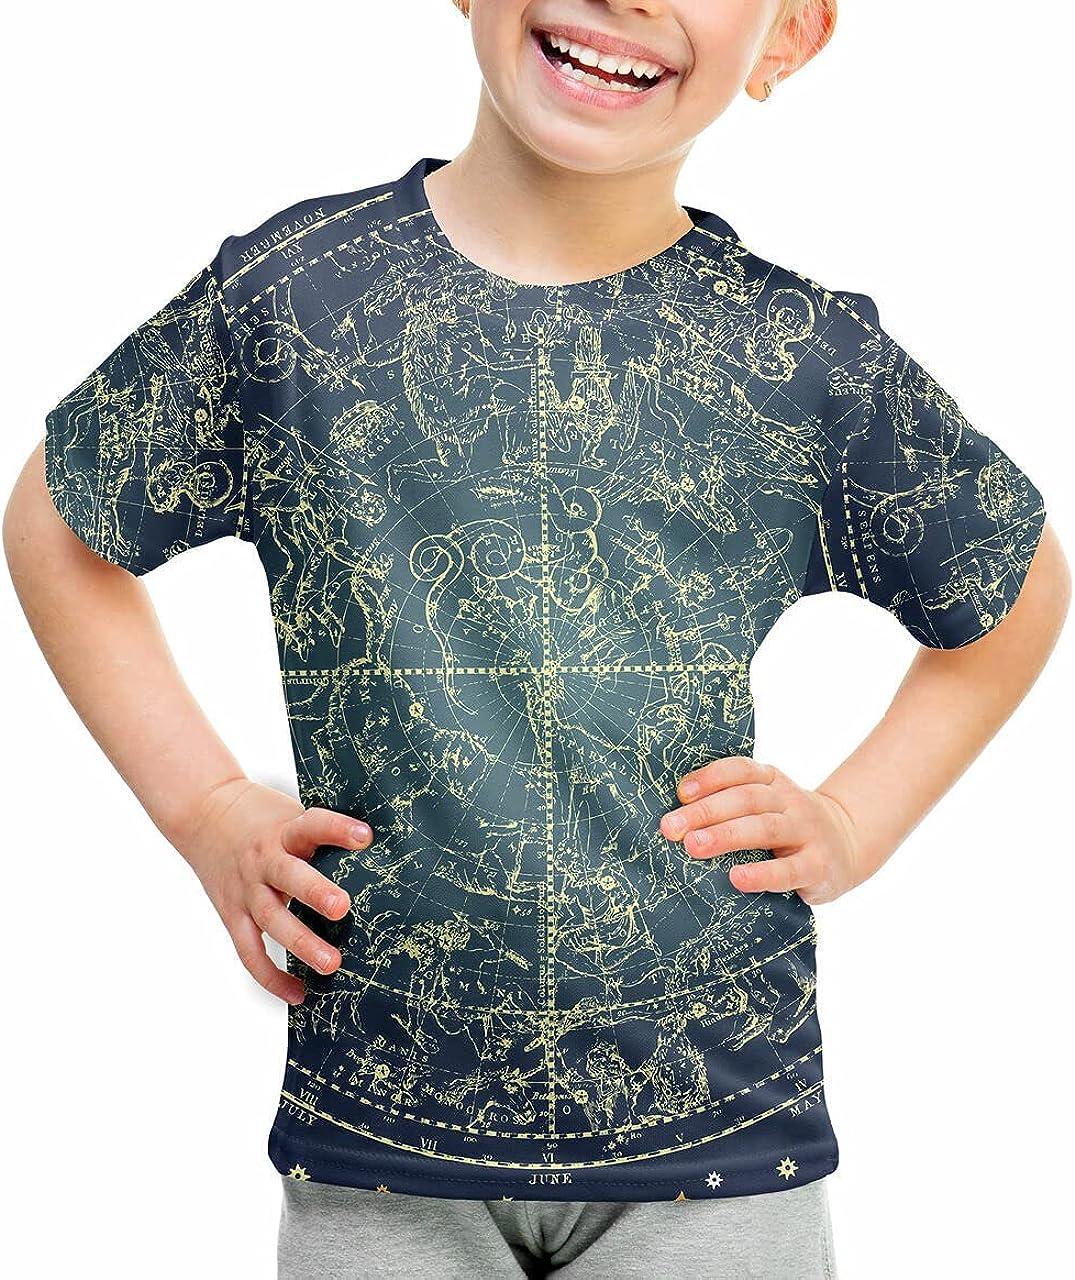 Over item handling Rainbow Rules Youth Cotton Blend Stars T-Shirt Constellations - Arlington Mall